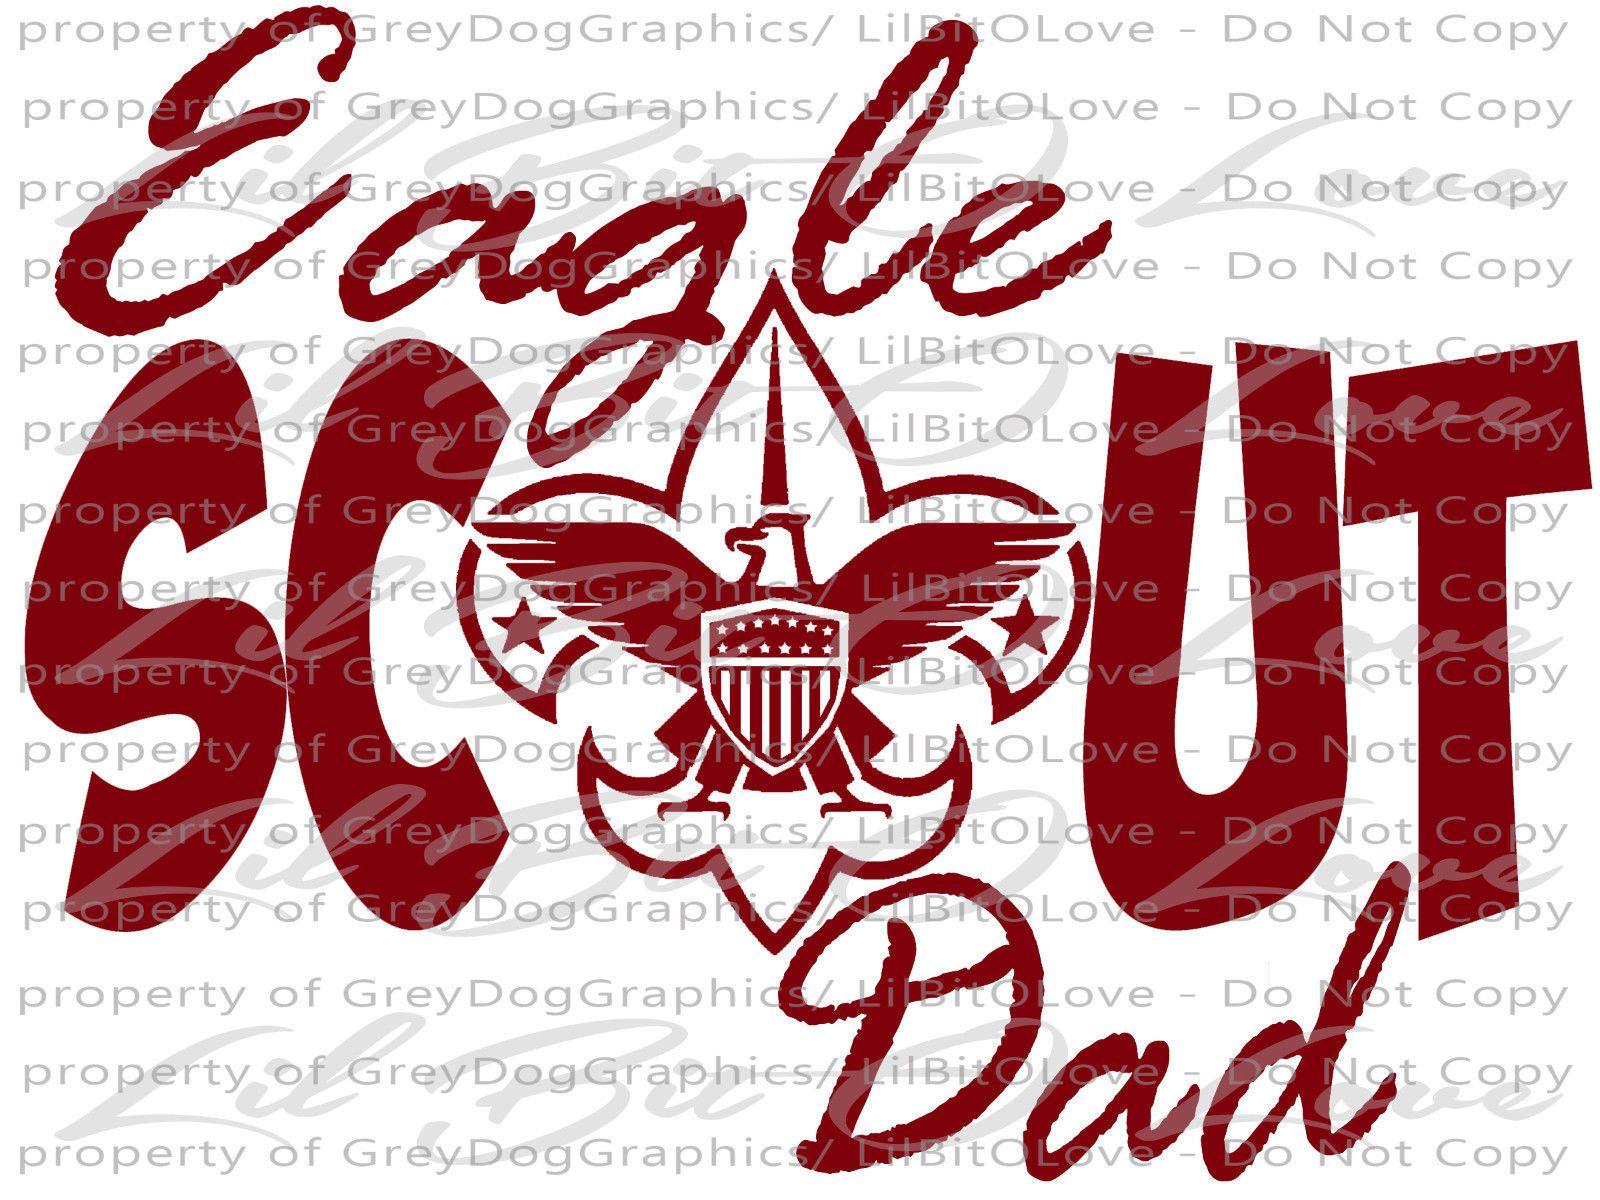 EAGLE SCOUT DAD VINYL DECAL BSA BOY SCOUTS VEHICLE CAR